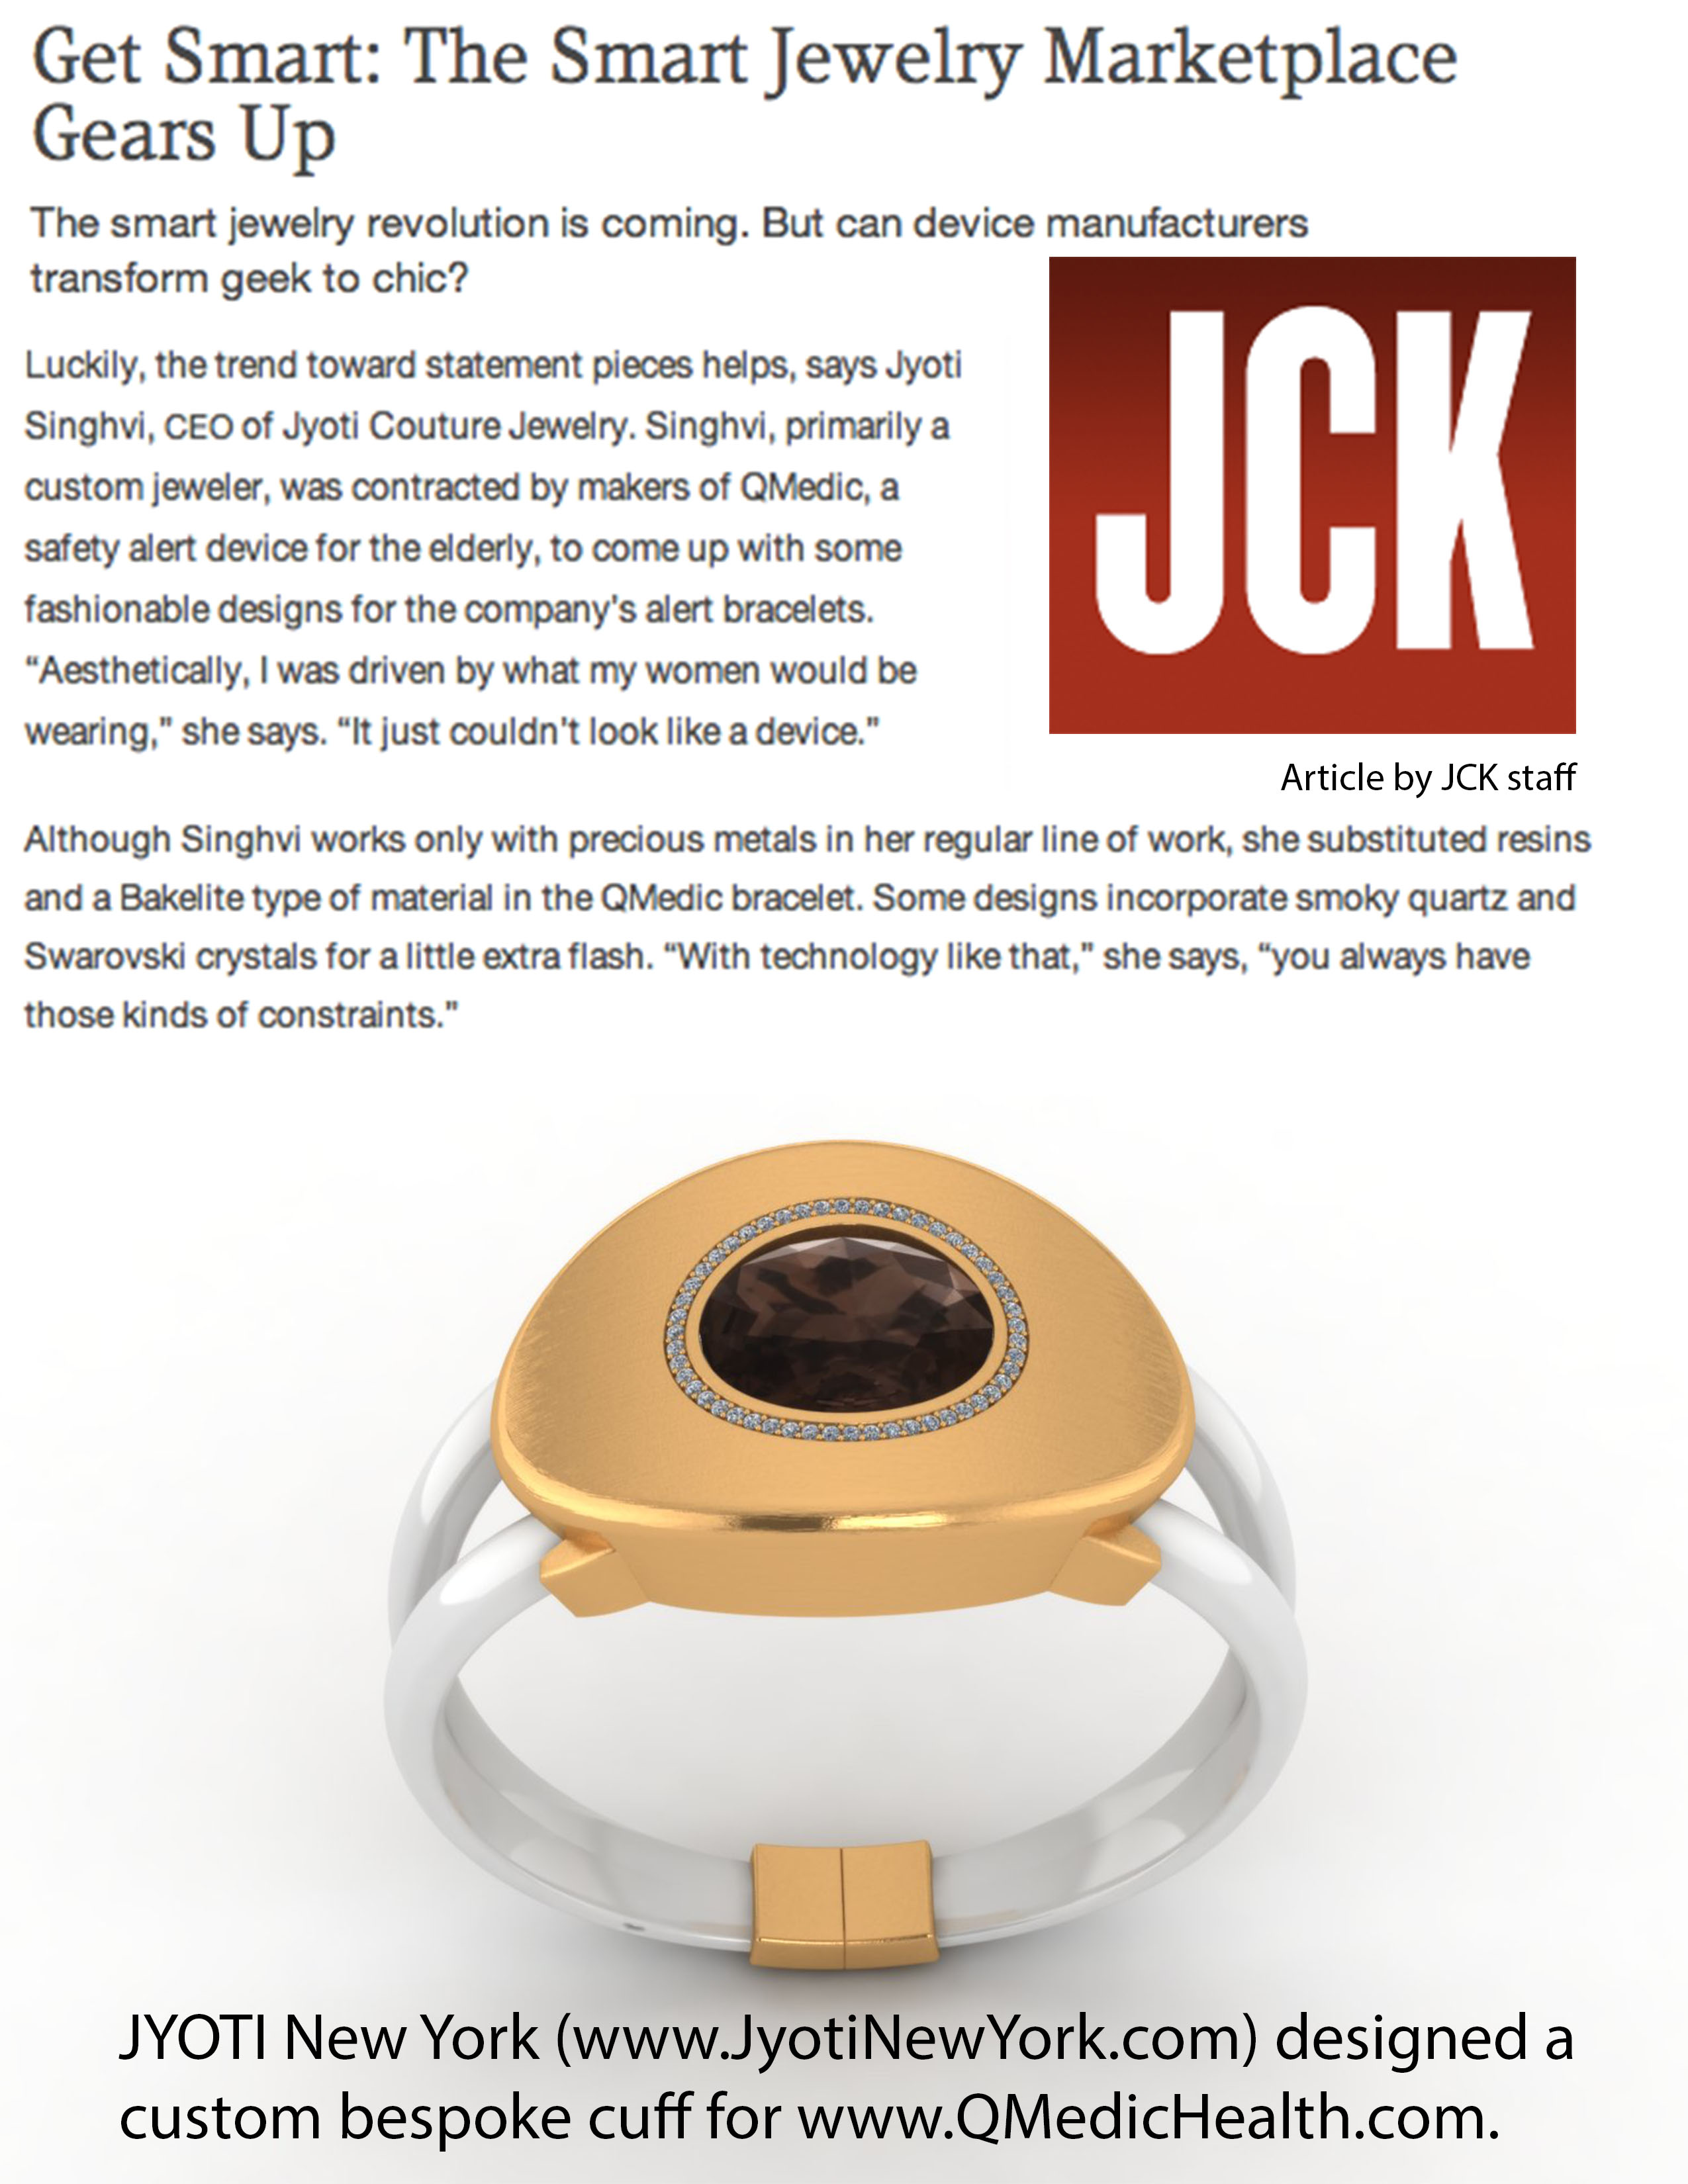 jck-magazine wearable computing cuff Jyoti Singhvi JYOTI New York Jewelry